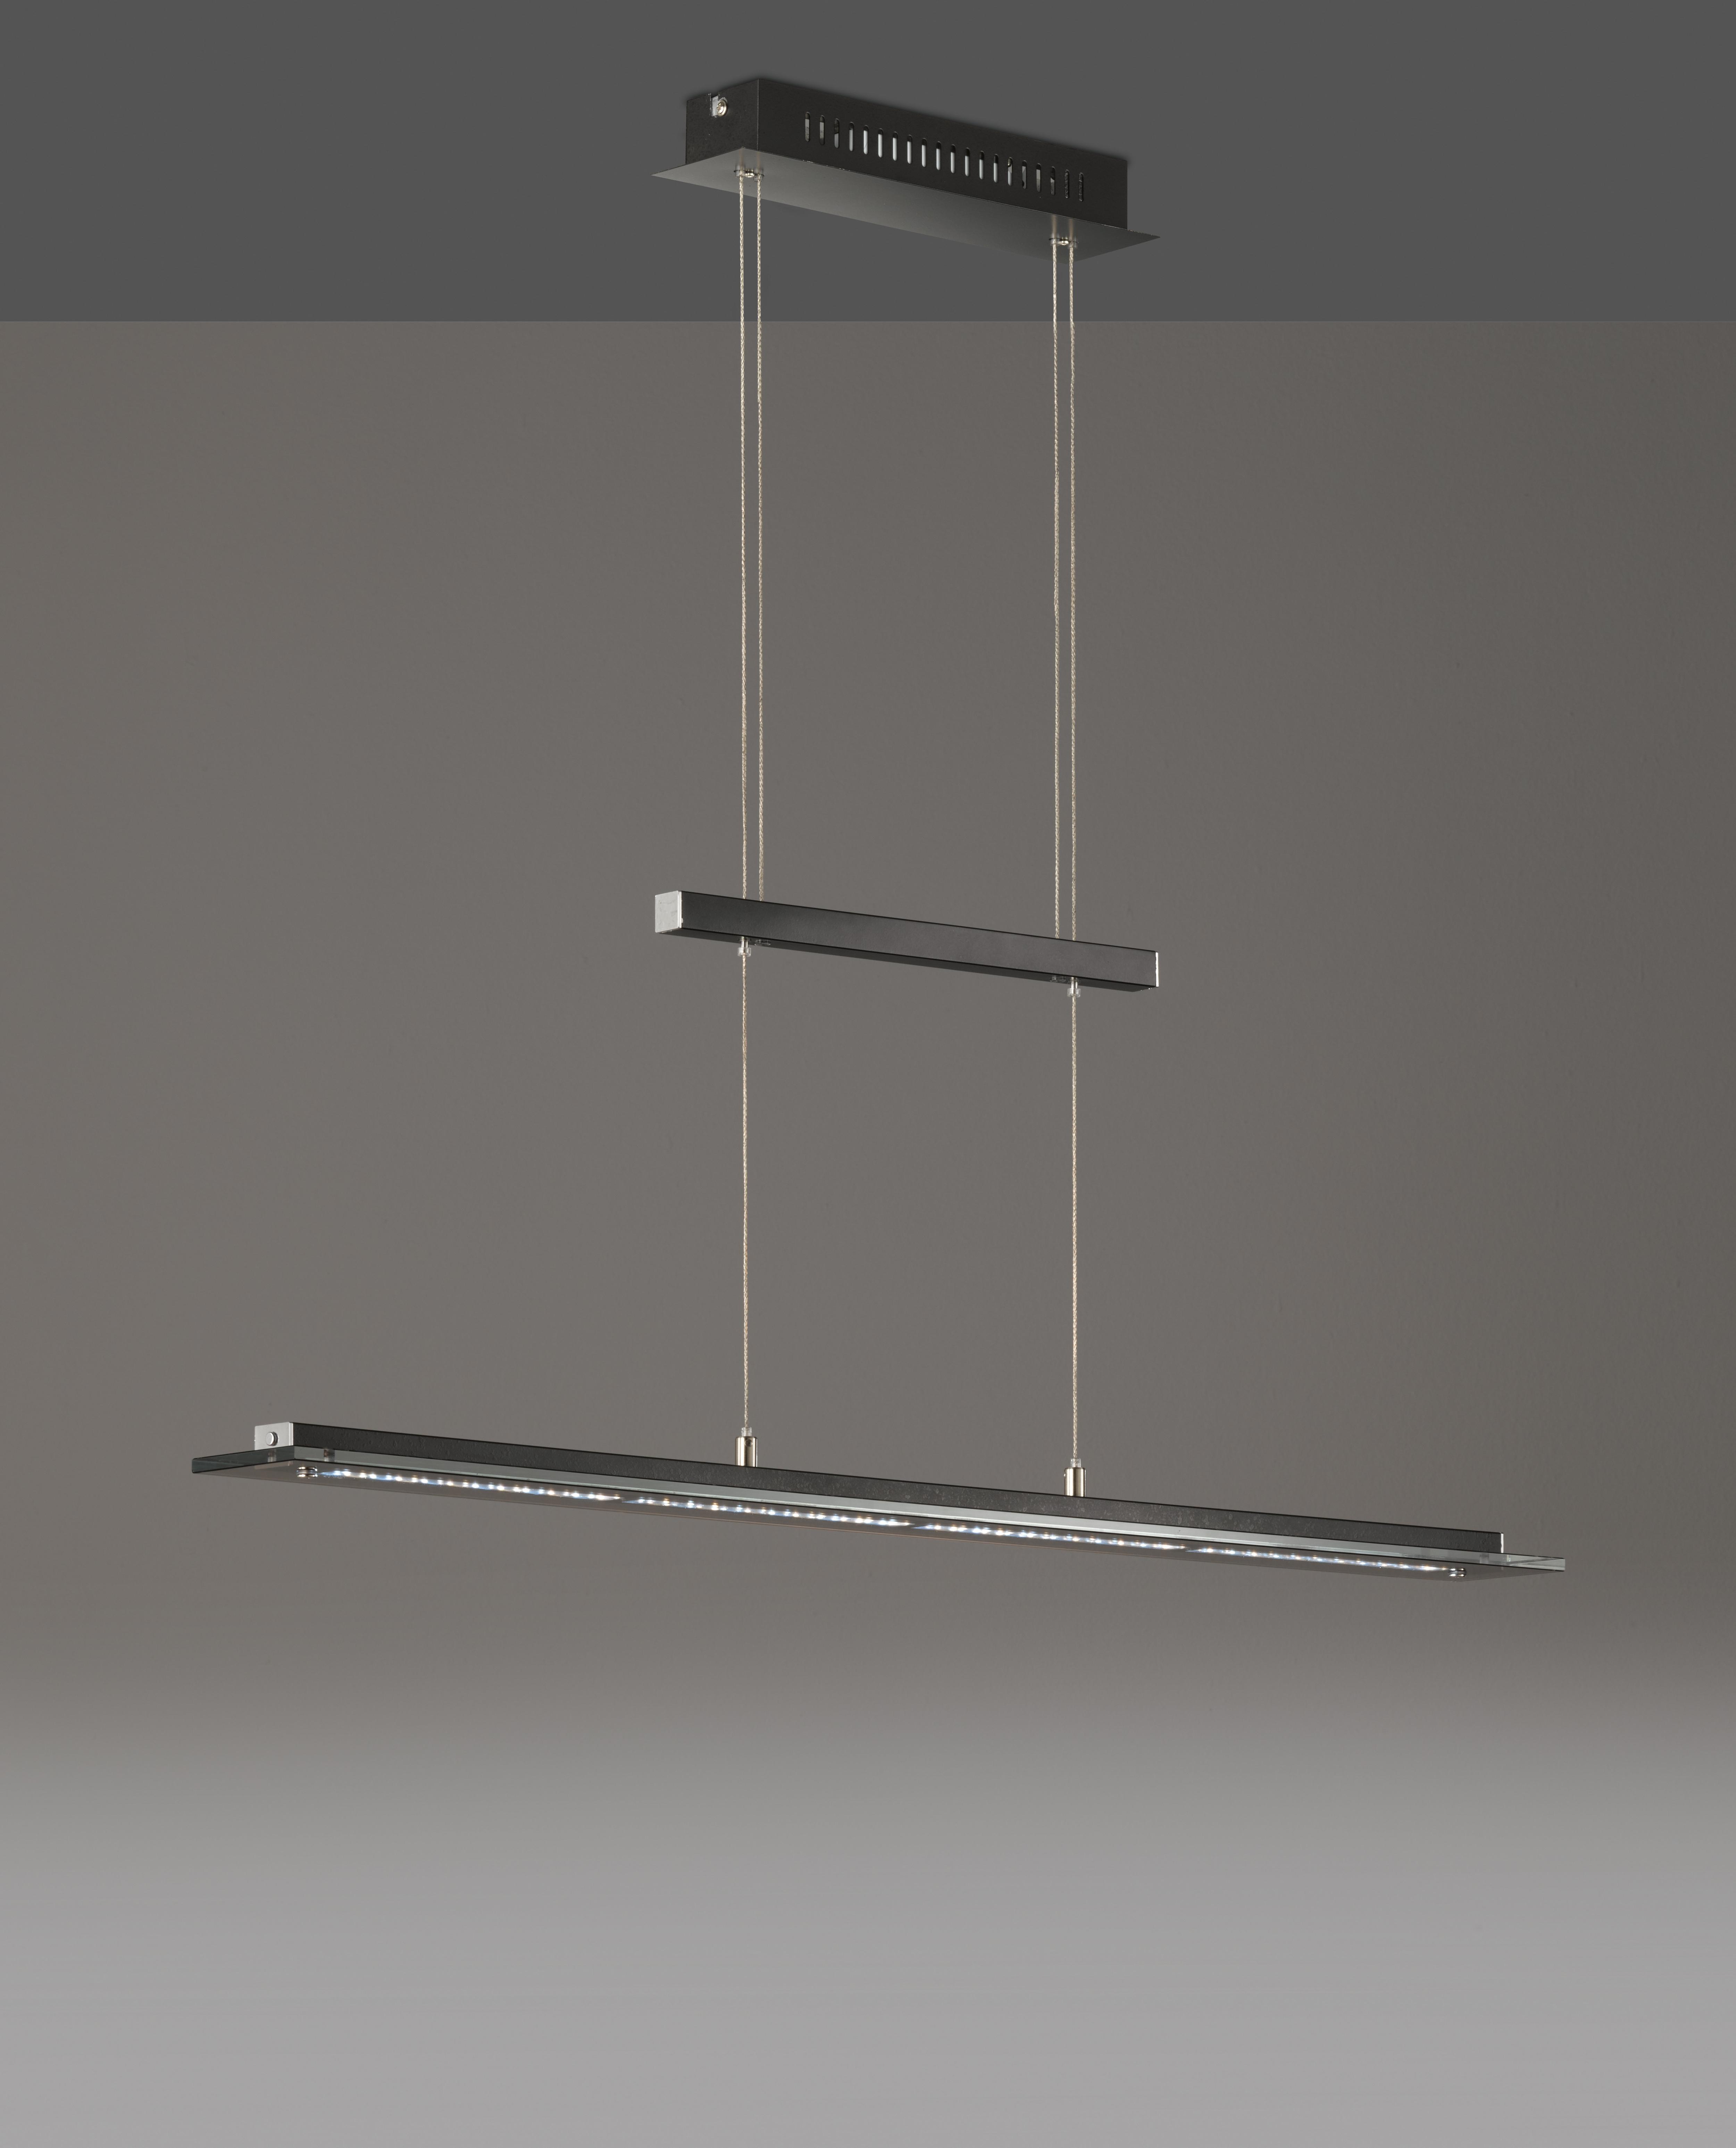 FISCHER & HONSEL LED Pendelleuchte Tenso TW, LED-Modul, Warmweiß-Neutralweiß